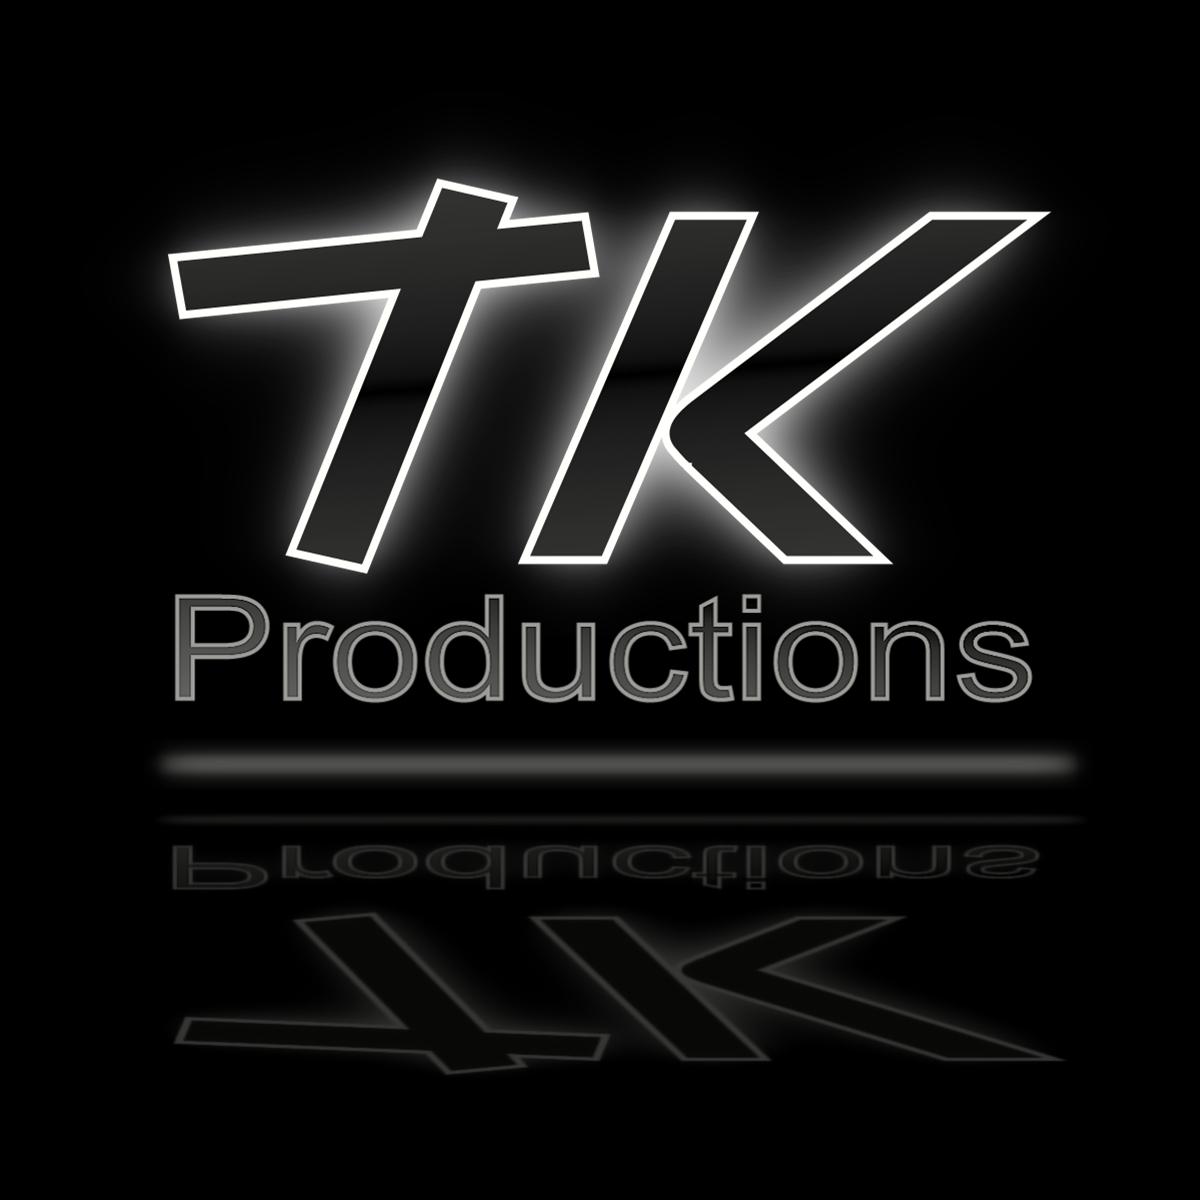 Logo Design by Joseph calunsag Cagaanan - Entry No. 83 in the Logo Design Contest TKProductions Logo Re-Vamp.